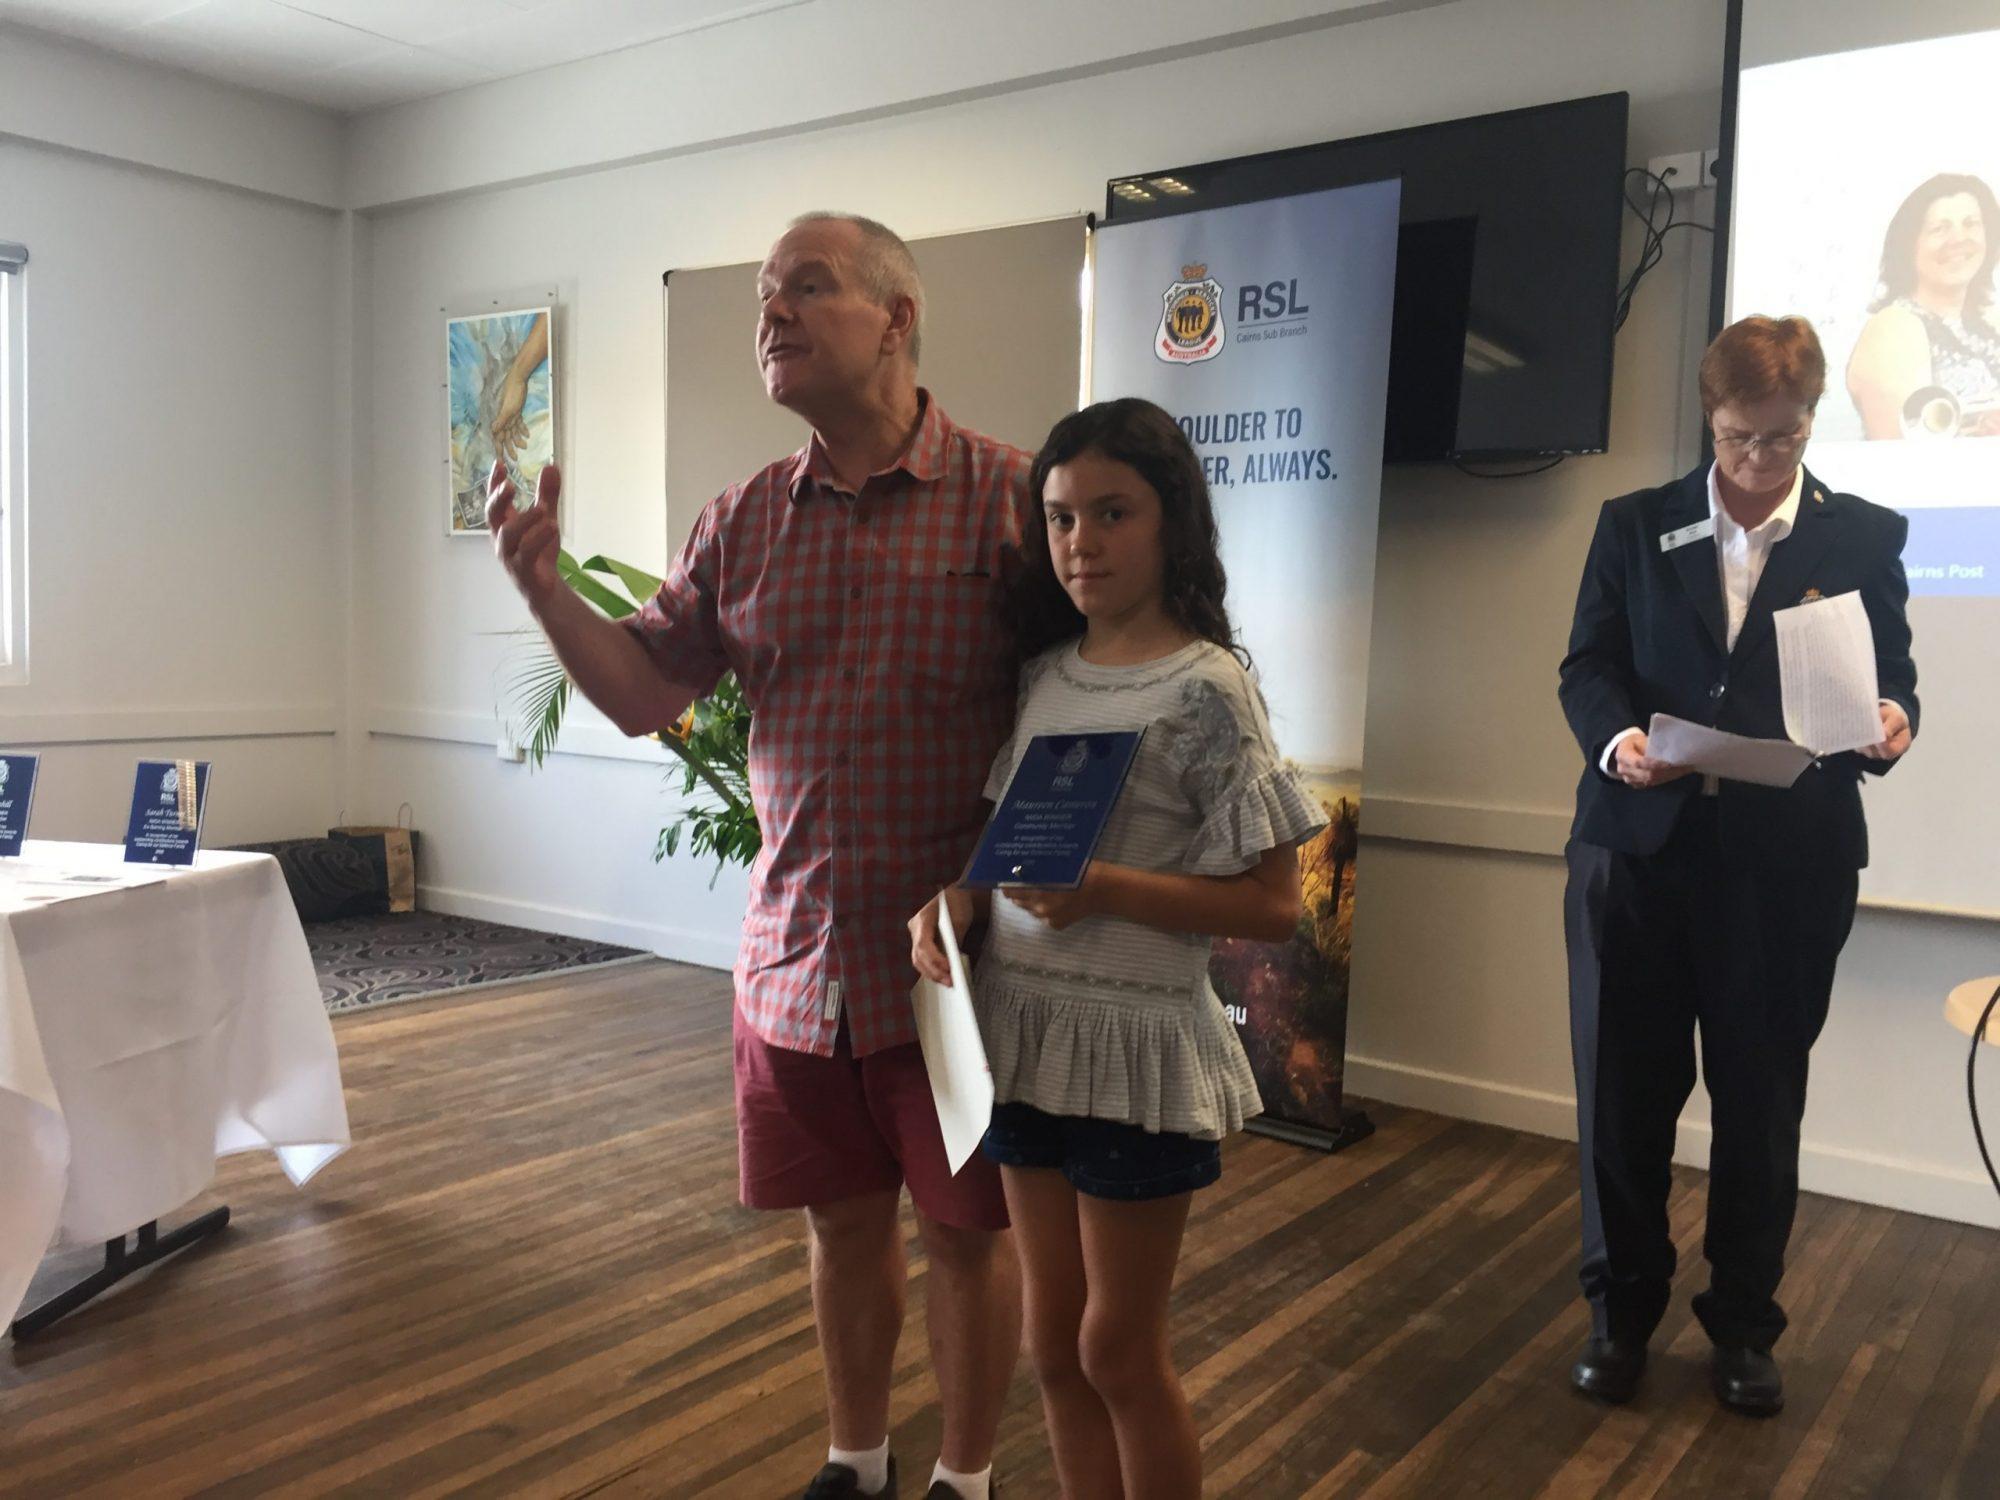 Refresh City Day Spa award winner Maureen Cameron